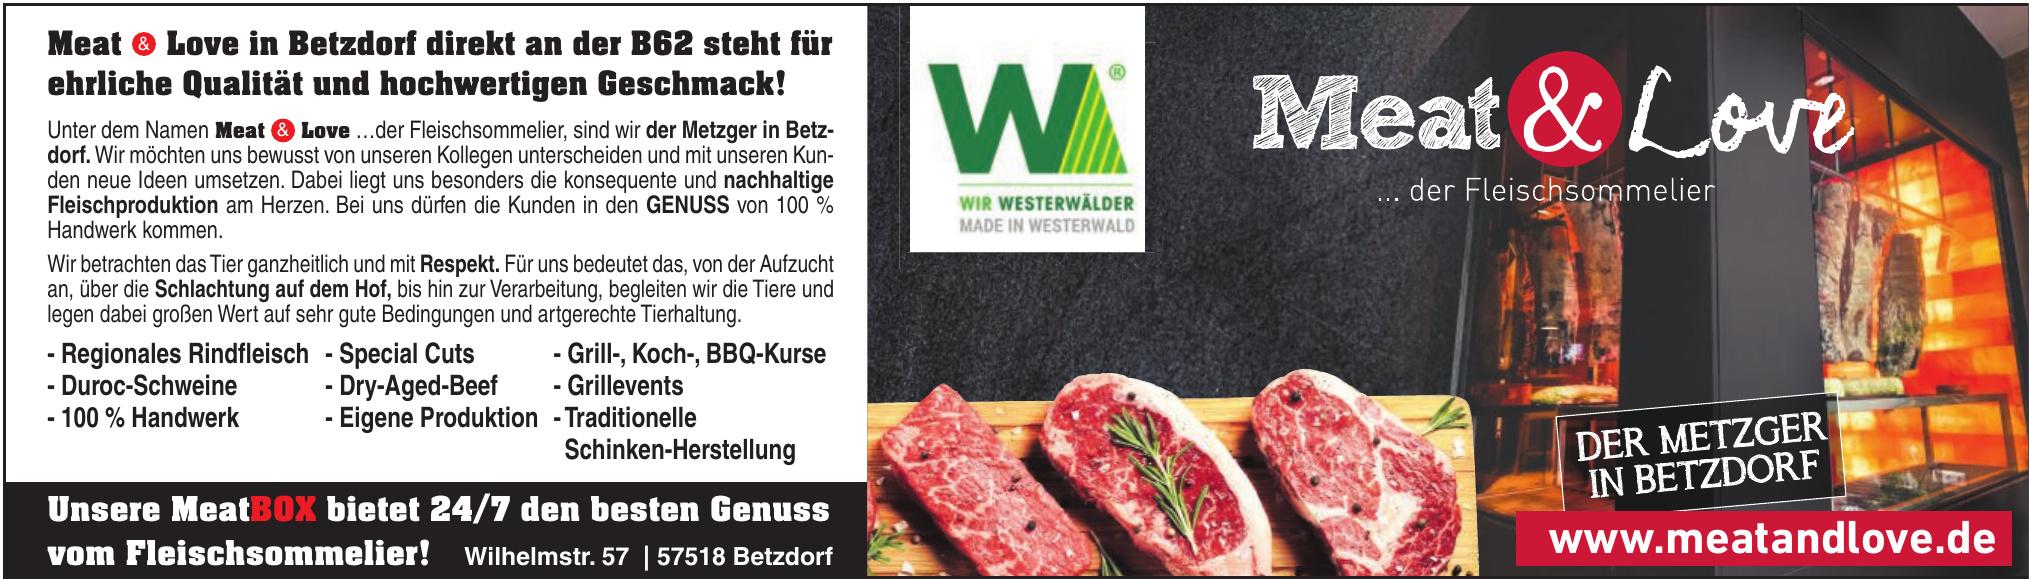 Meat & Love